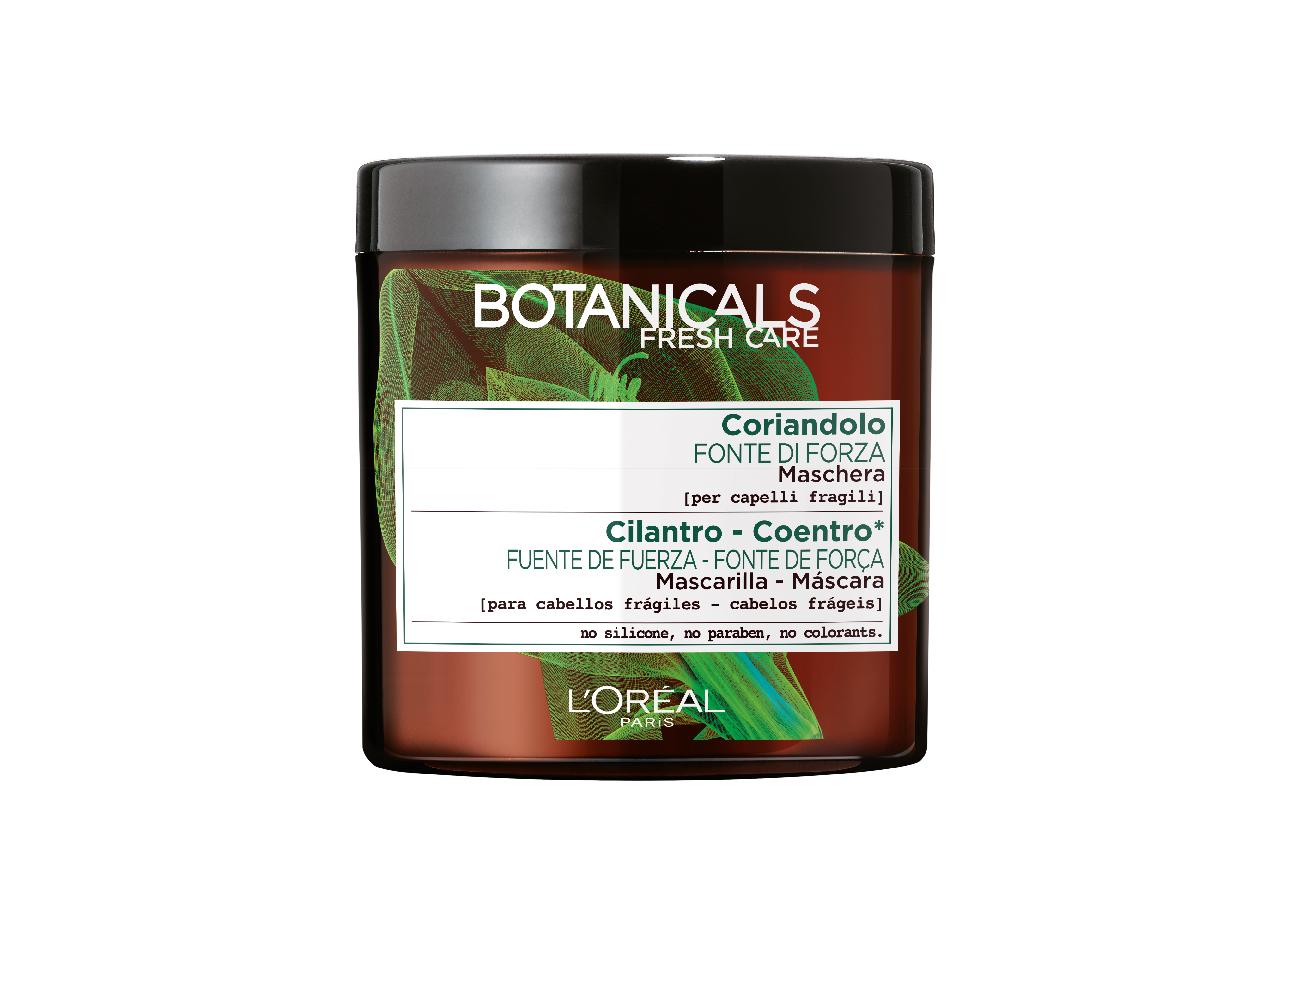 Image of Botanicals Fresh Care Maschera Rinforzante Coriandolo 200ml